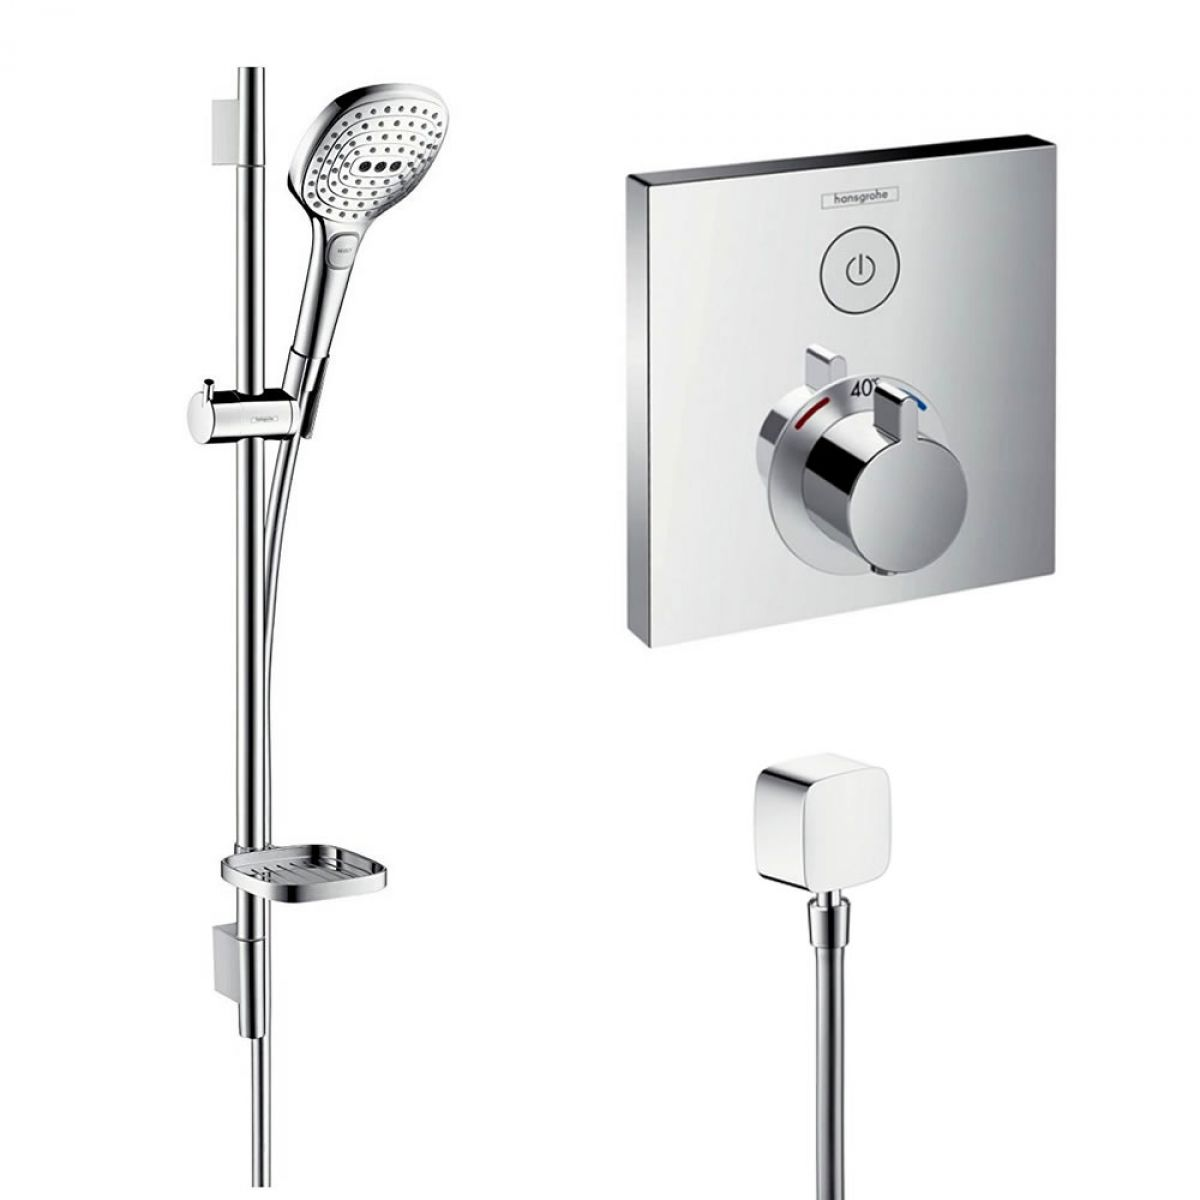 Hansgrohe Raindance Select System 2 Shower Kit